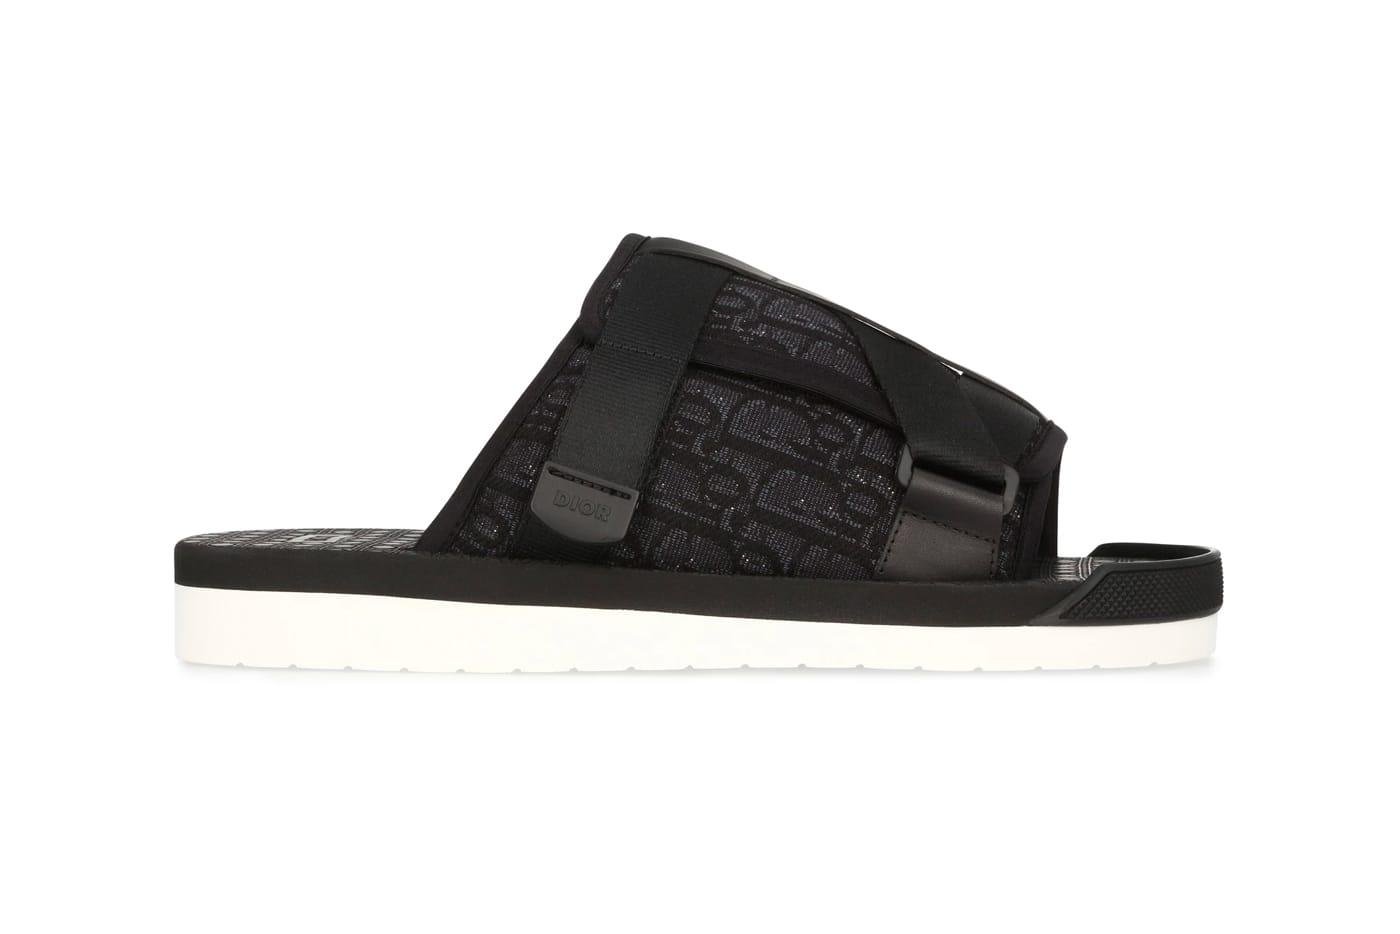 Dior Oblique Alpha Sandals Release